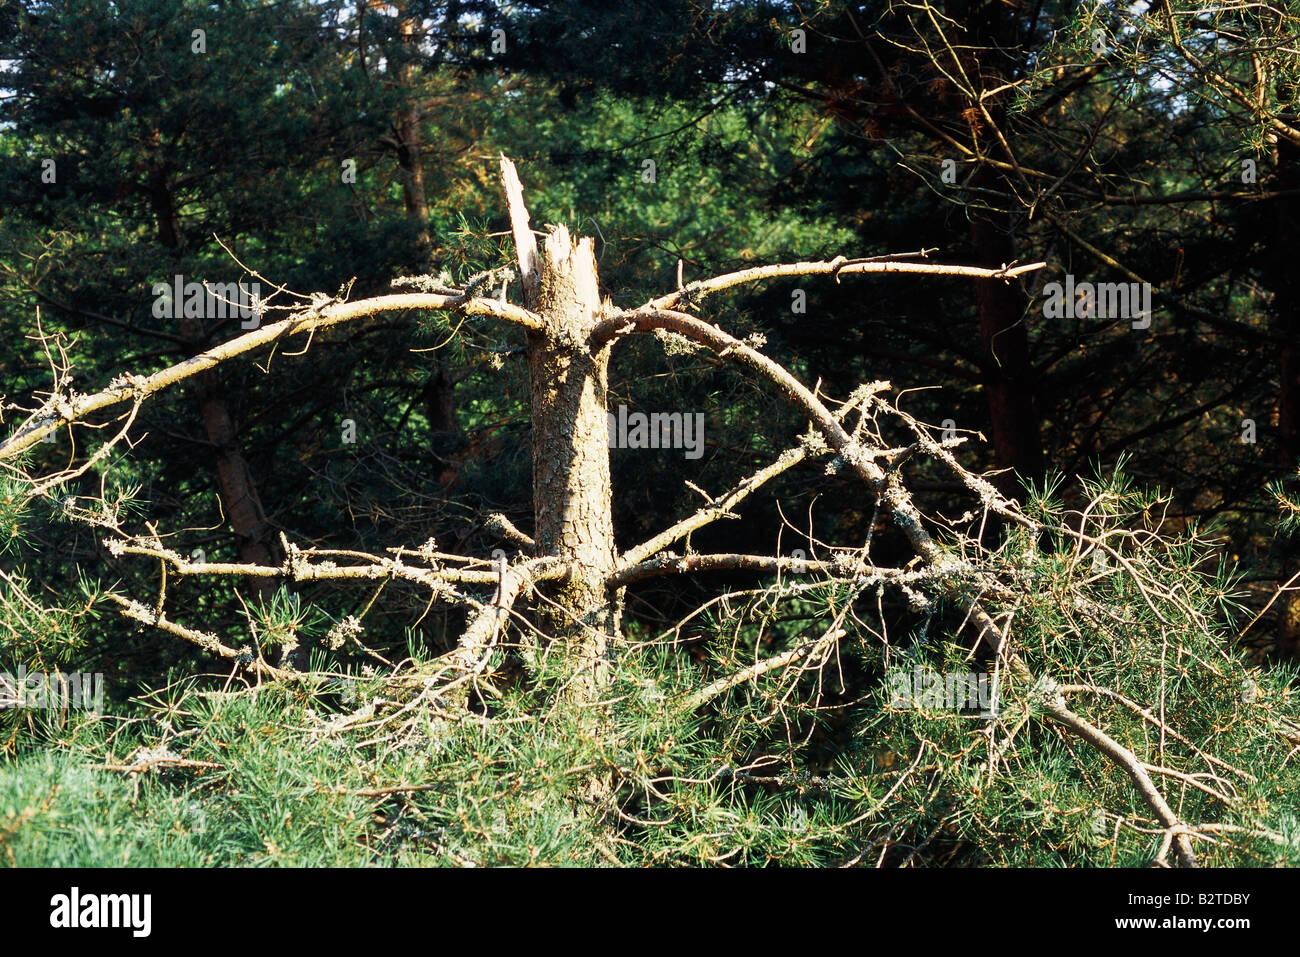 Damaged pine tree - Stock Image